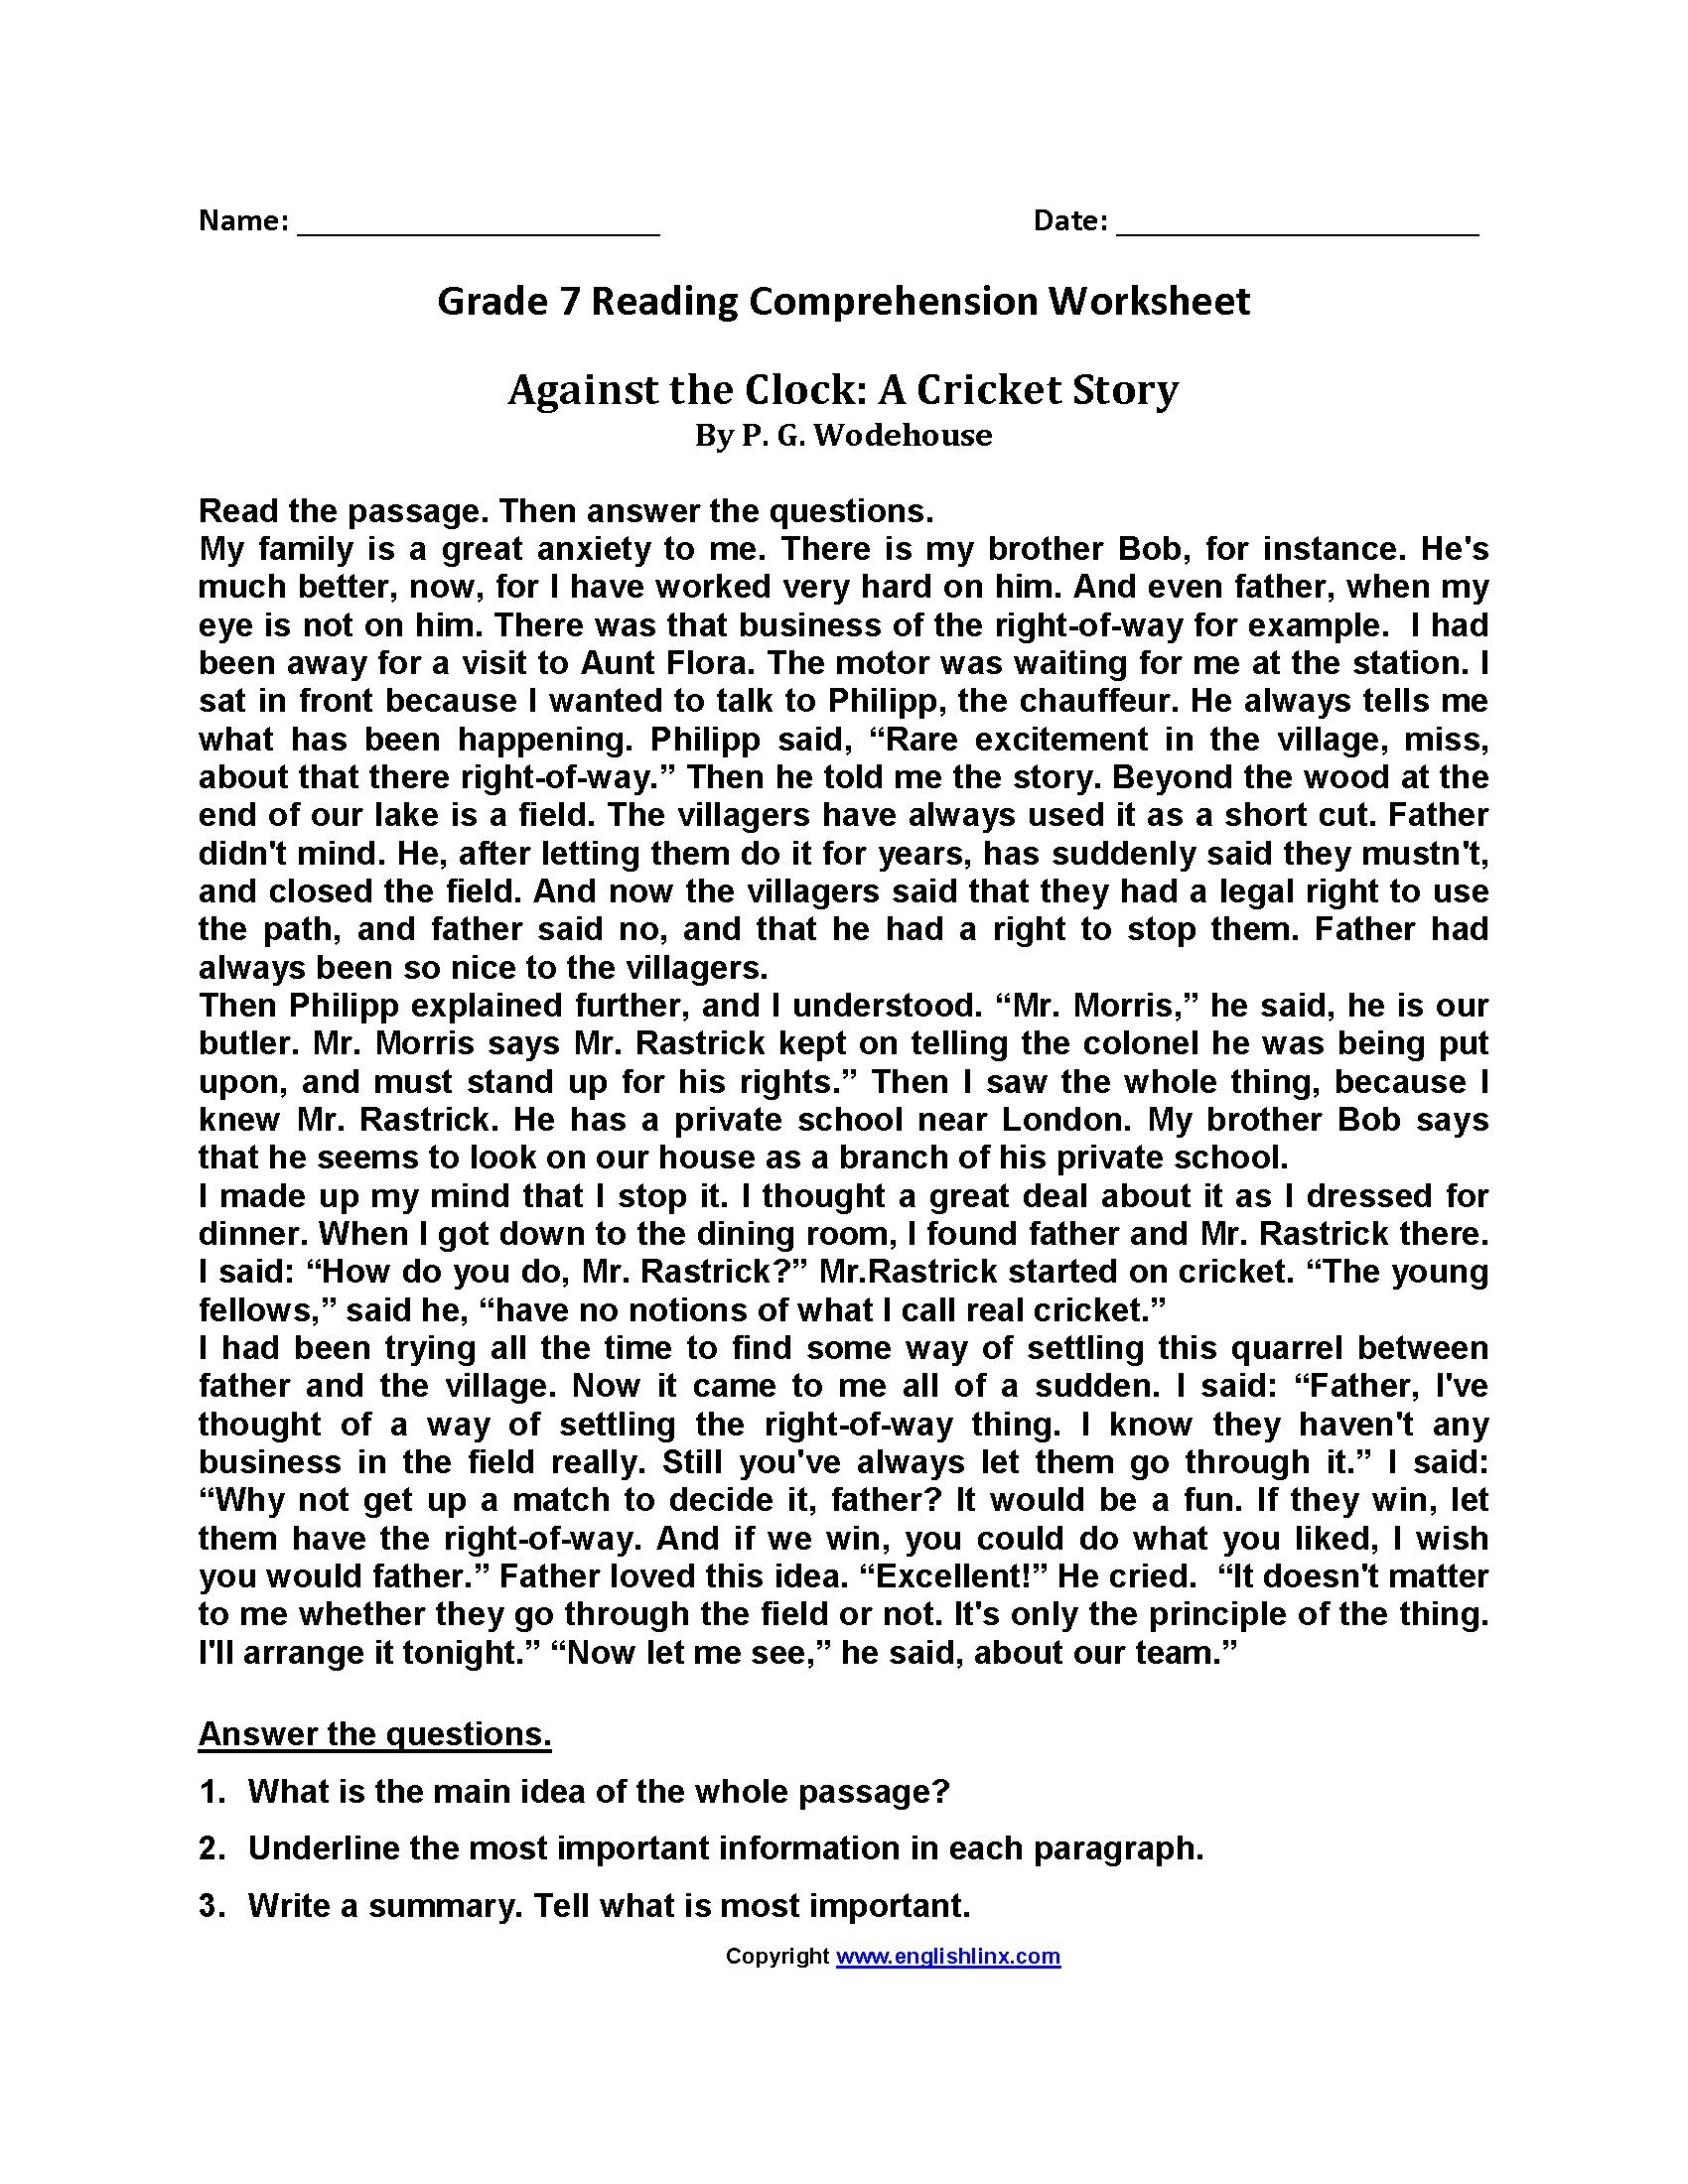 7 General Summarizing Worksheets 3rd Grade In 2020 Reading Comprehension Worksheets Comprehension Worksheets Reading Worksheets